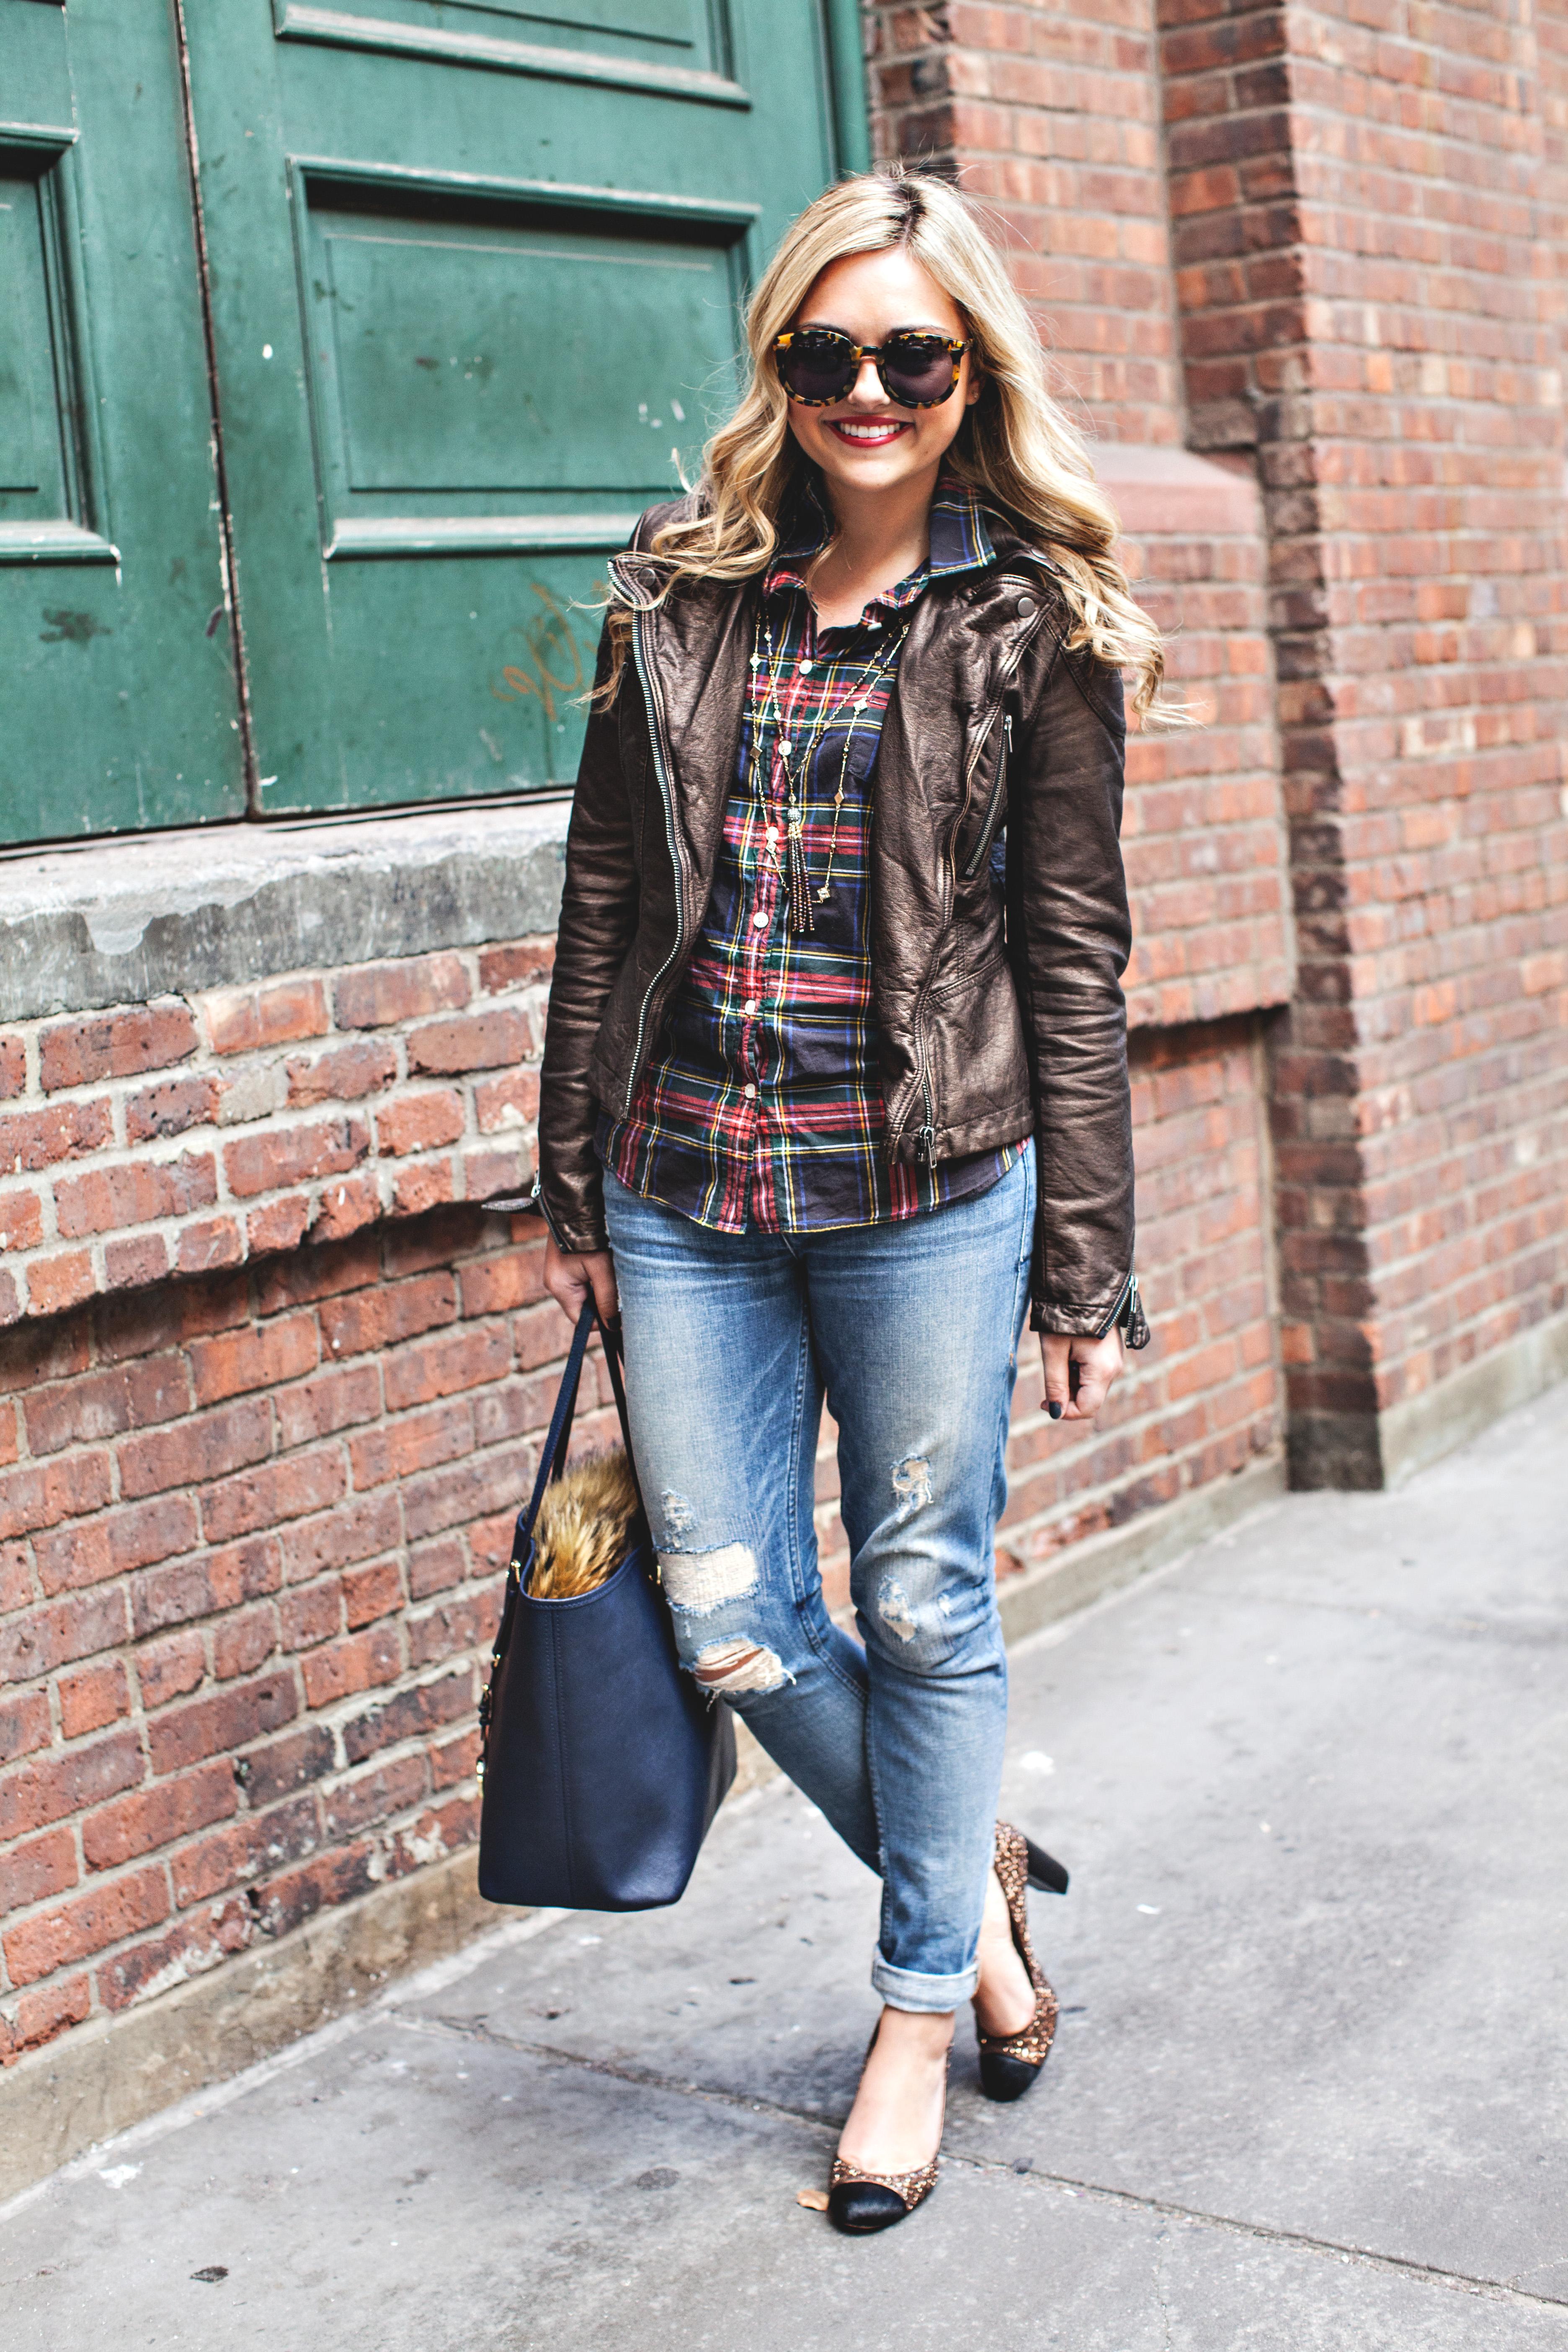 Fancy Footwear — bows & sequins